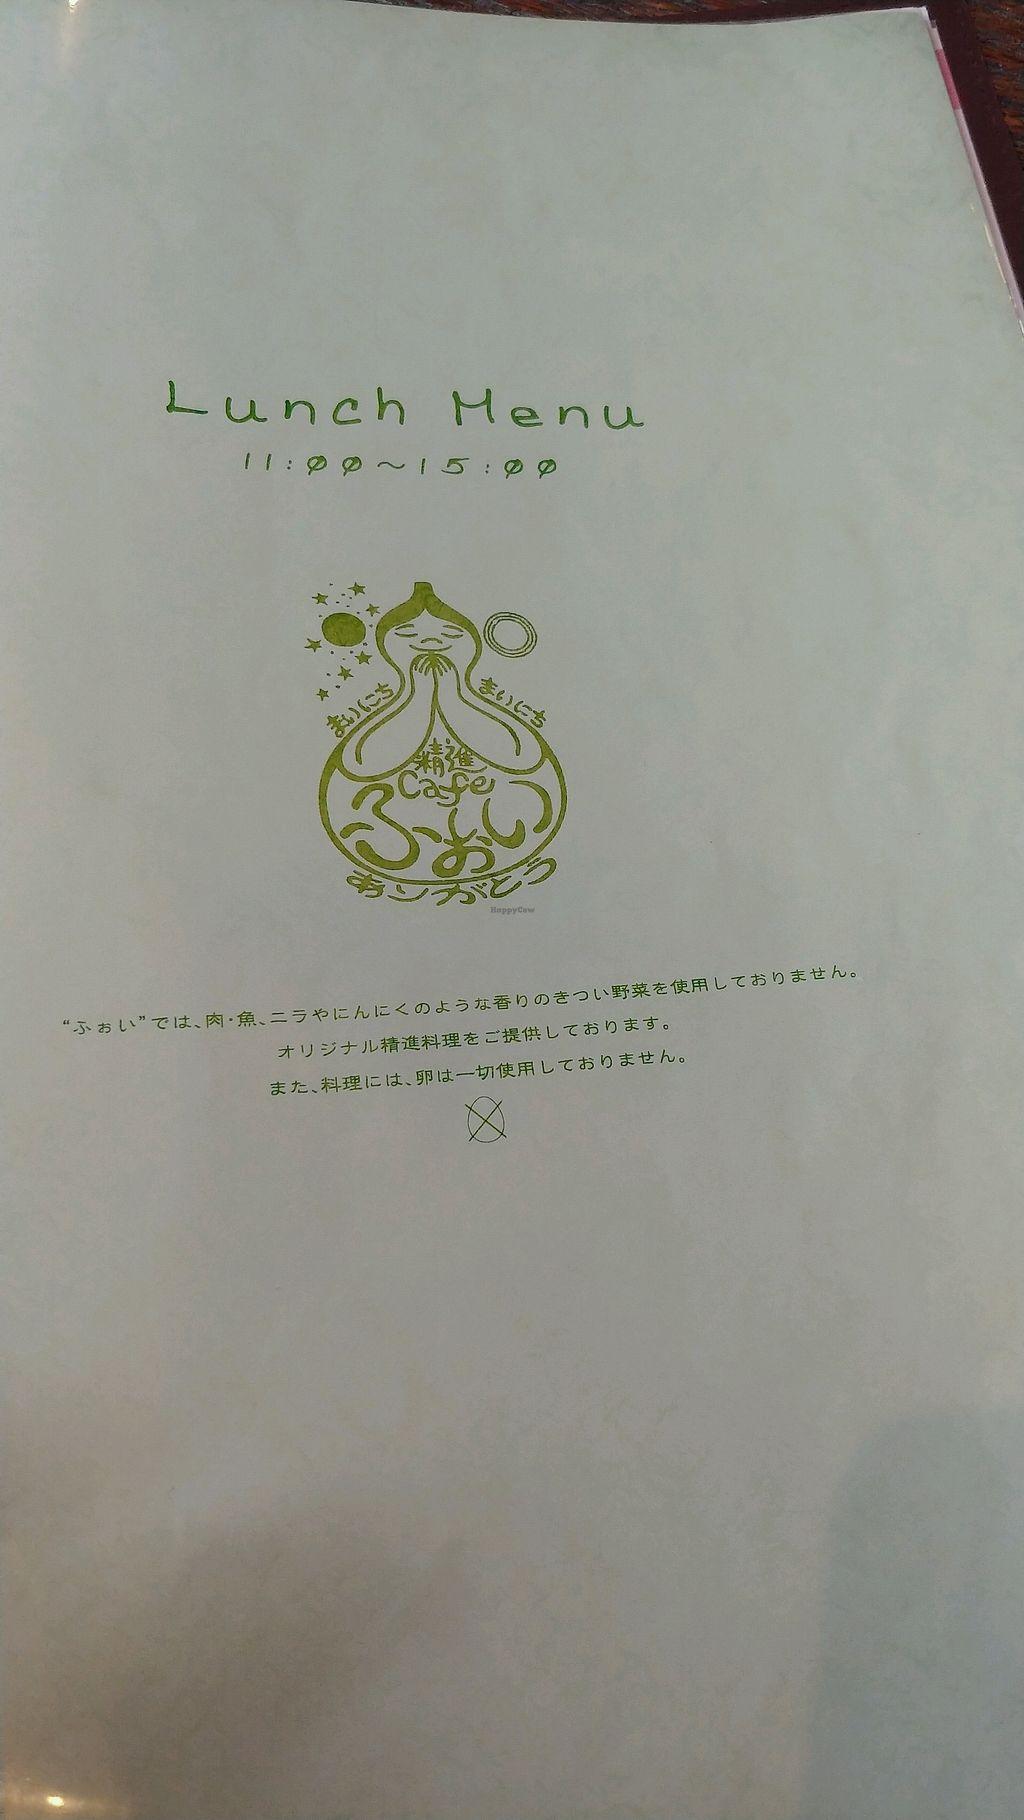 "Photo of Shojin Cafe Foi - Nishikuginukicho  by <a href=""/members/profile/BananaCrime0731"">BananaCrime0731</a> <br/>menu 1 <br/> December 30, 2017  - <a href='/contact/abuse/image/67886/341090'>Report</a>"